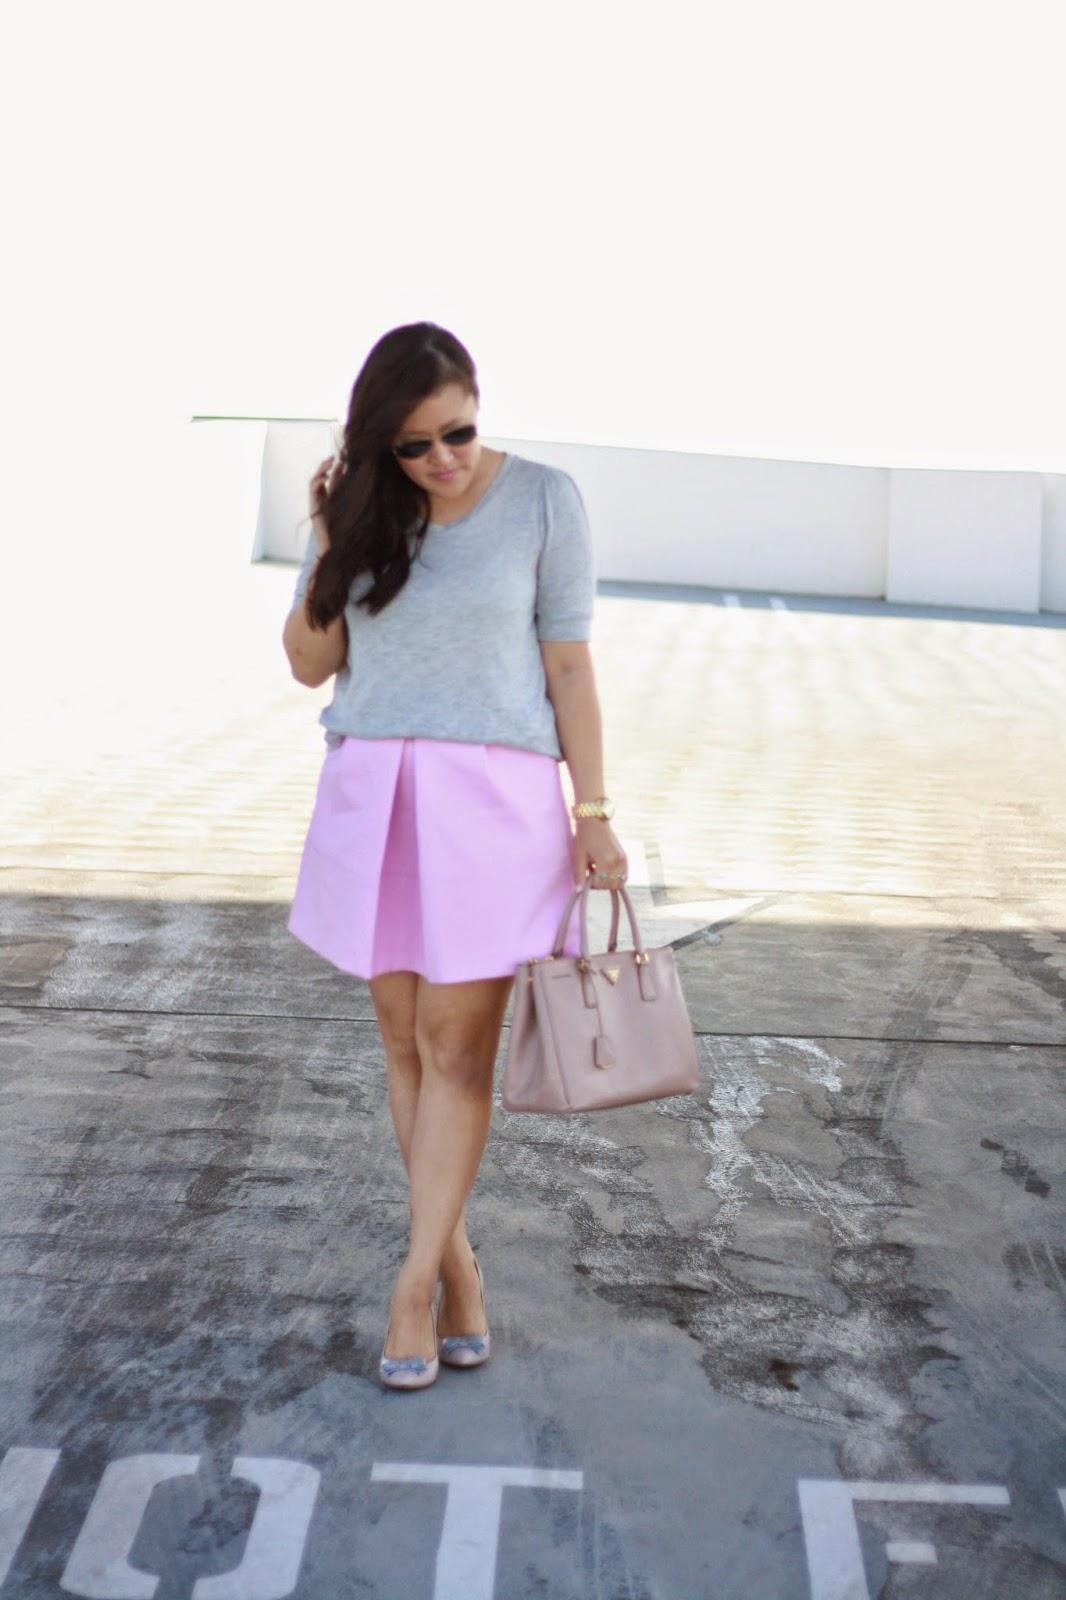 simplyxclassic, ootd, blogger, fashion blogger, orange county, los angeles, jcrew skirt, prada handbag, crew factory pumps, bow heels, pink skirt